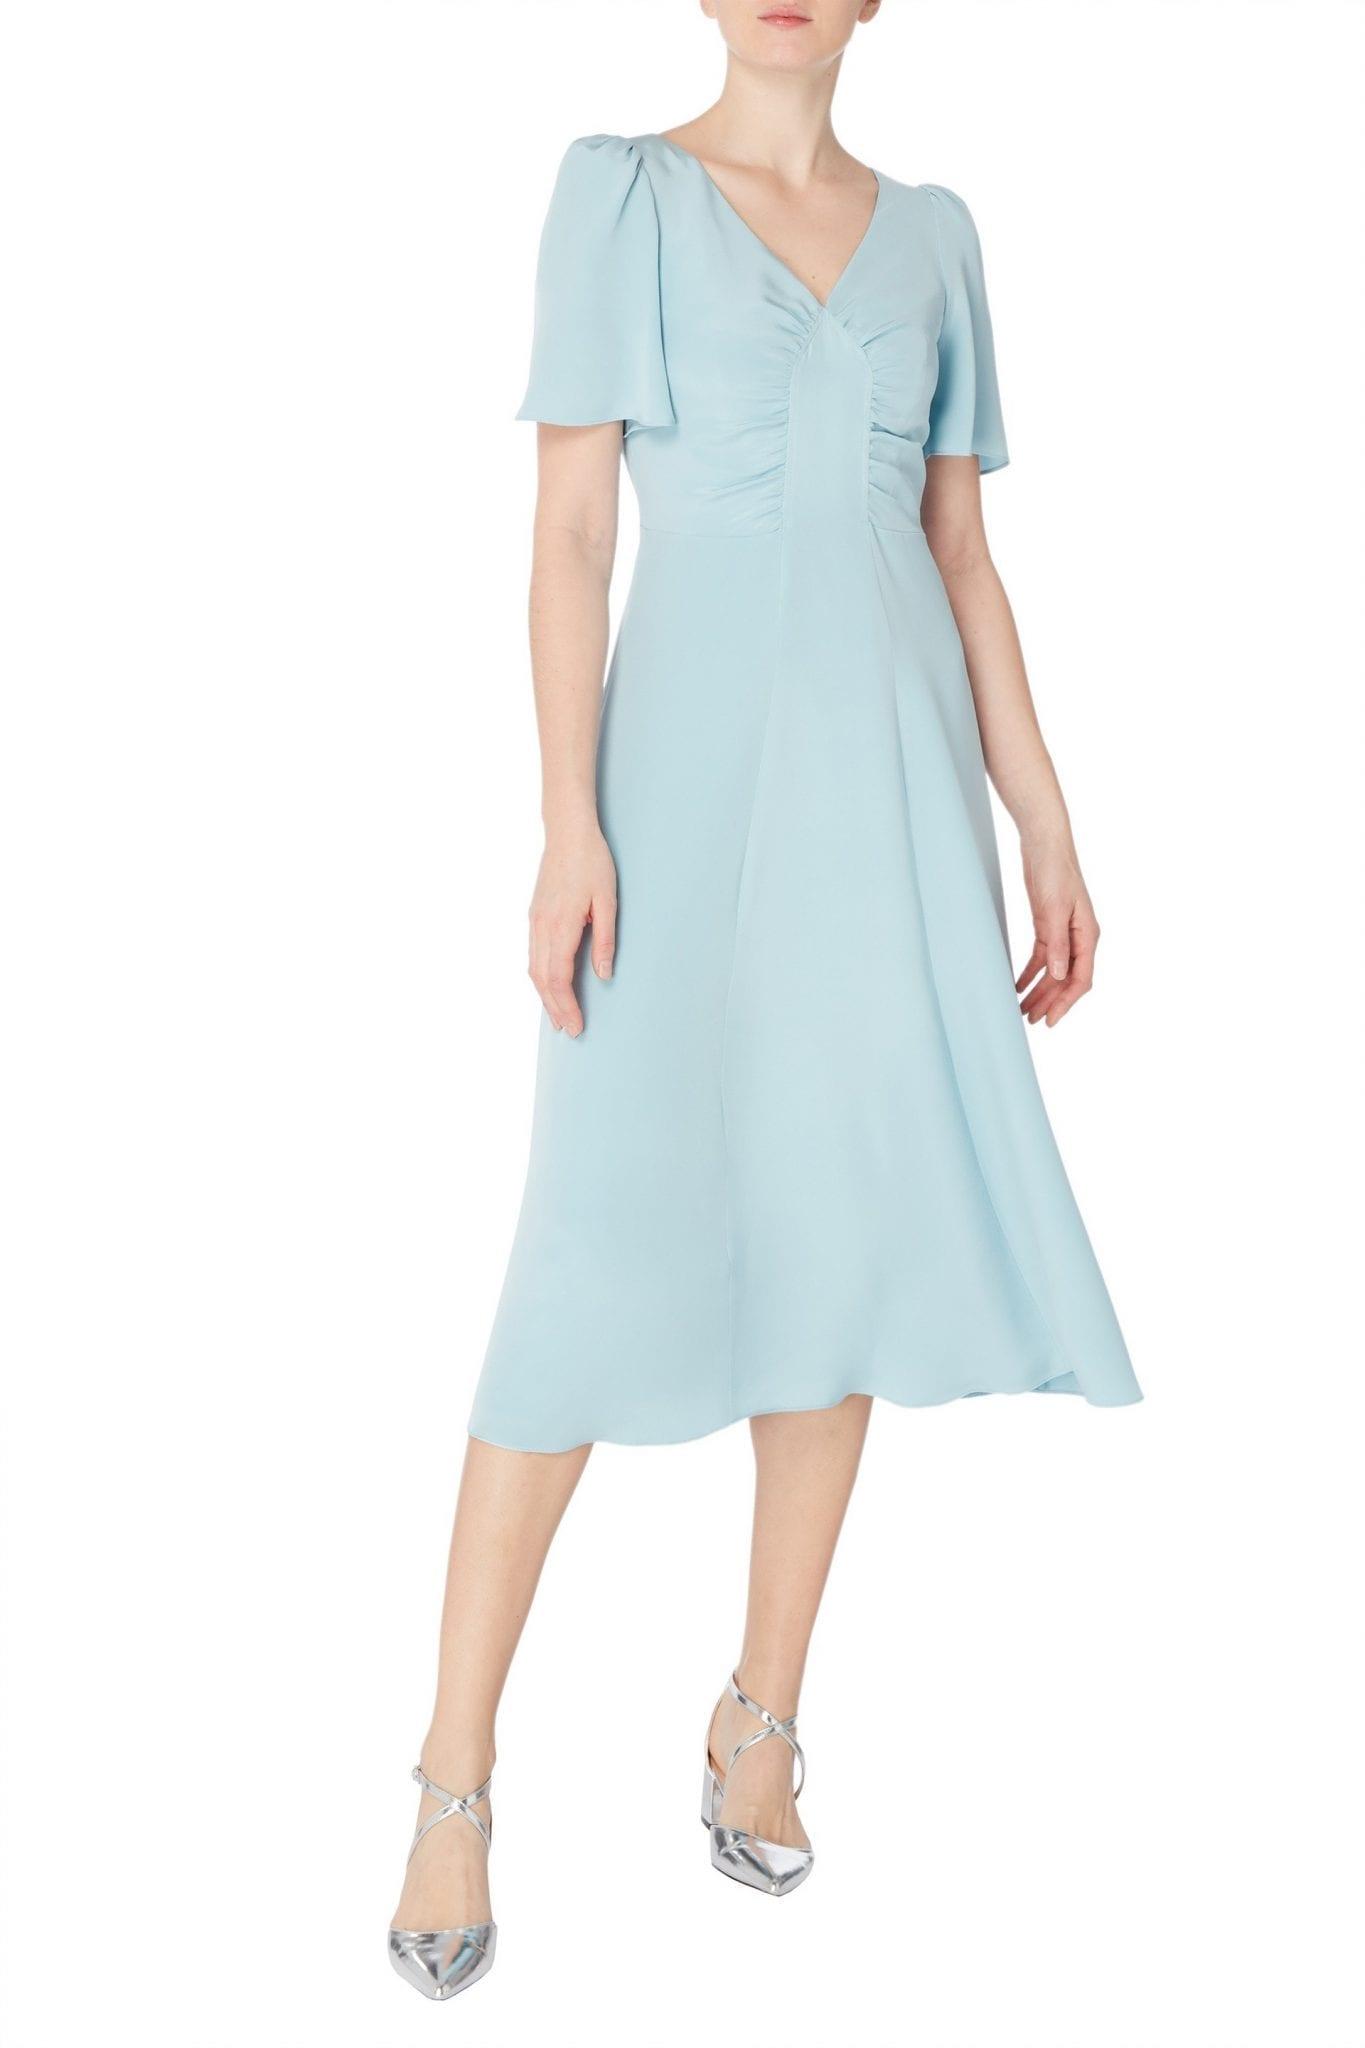 GOAT FASHION Rosemary Tea Dress